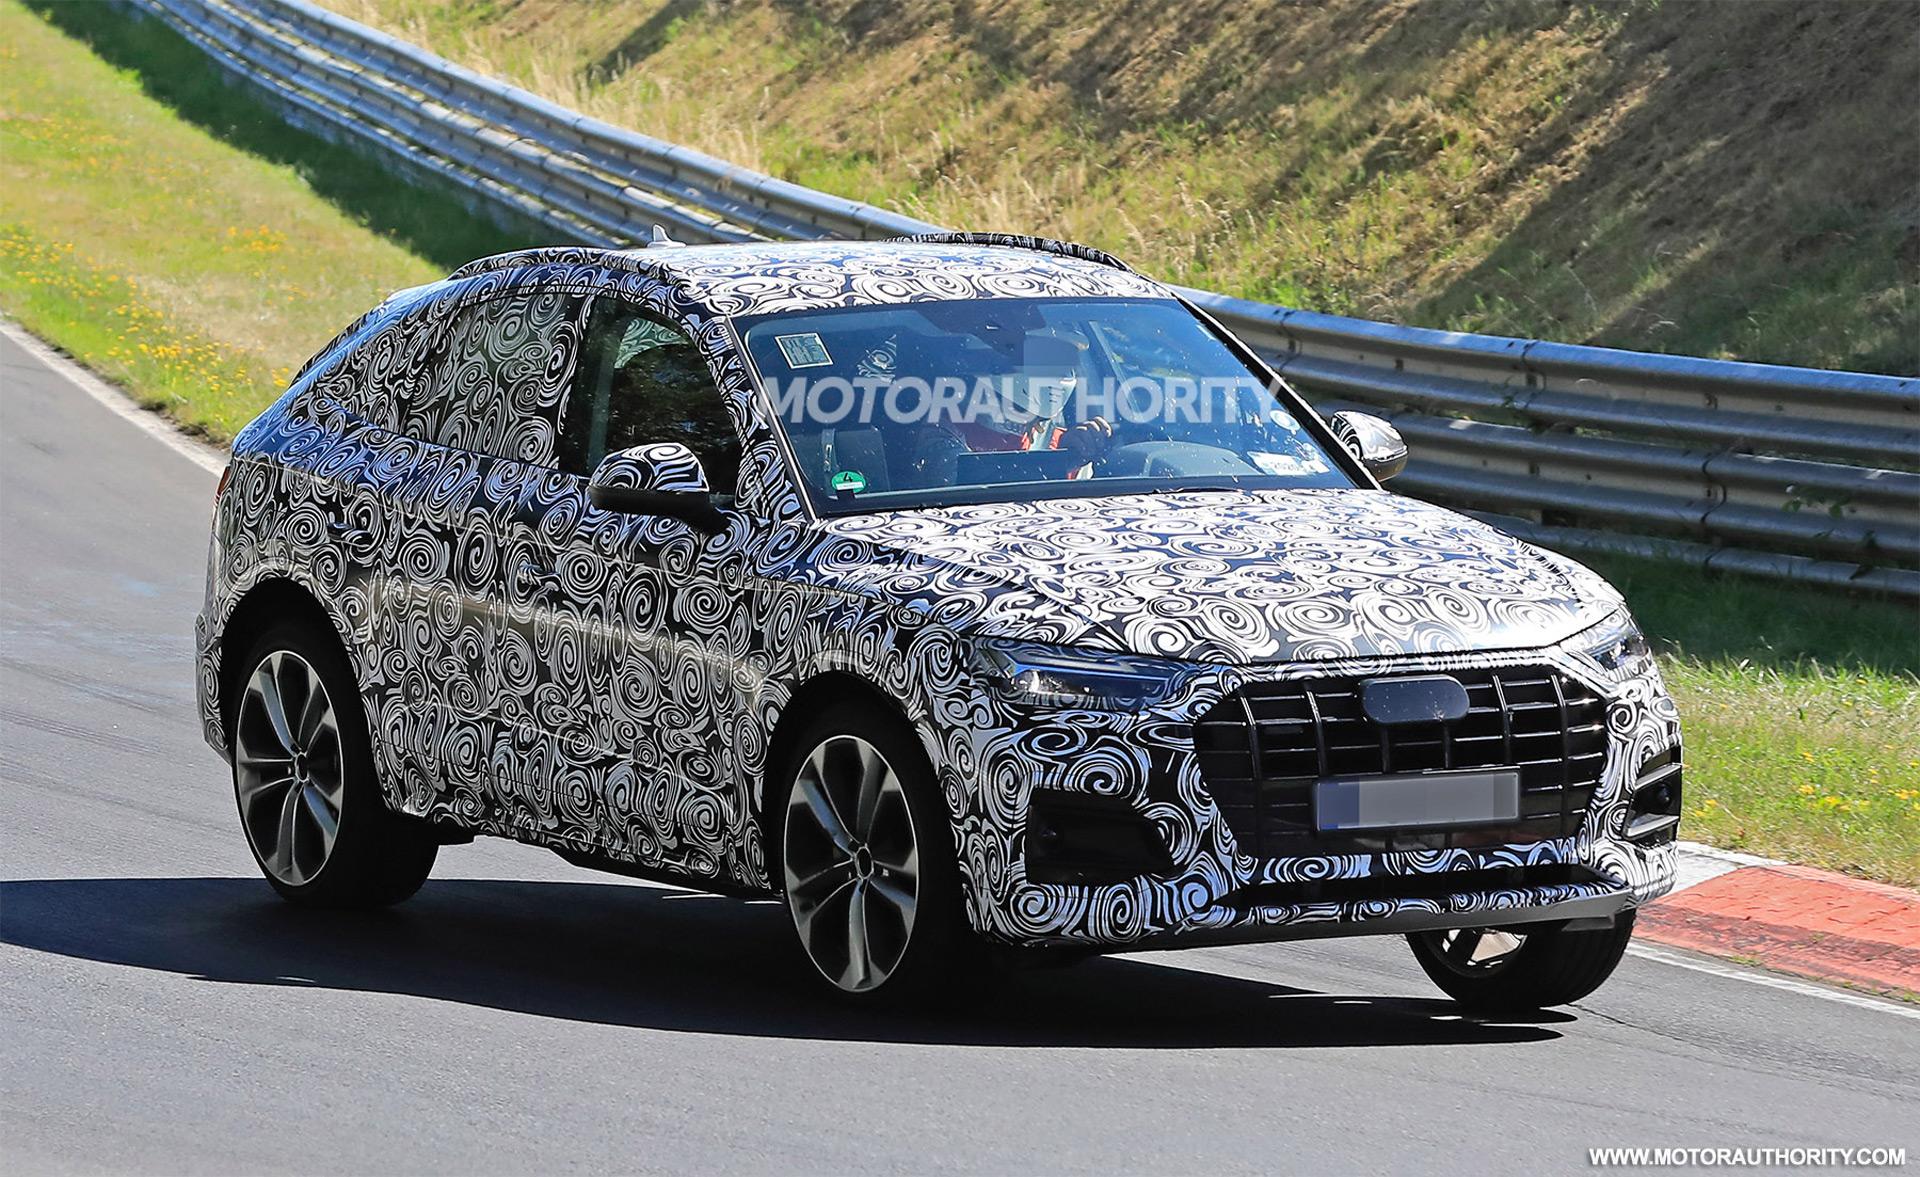 2020 - [Audi] Q5 Sportback - Page 7 2021-audi-q5-sportback-spy-shots--picture-credits-baldauf-sb-medien_100753278_h